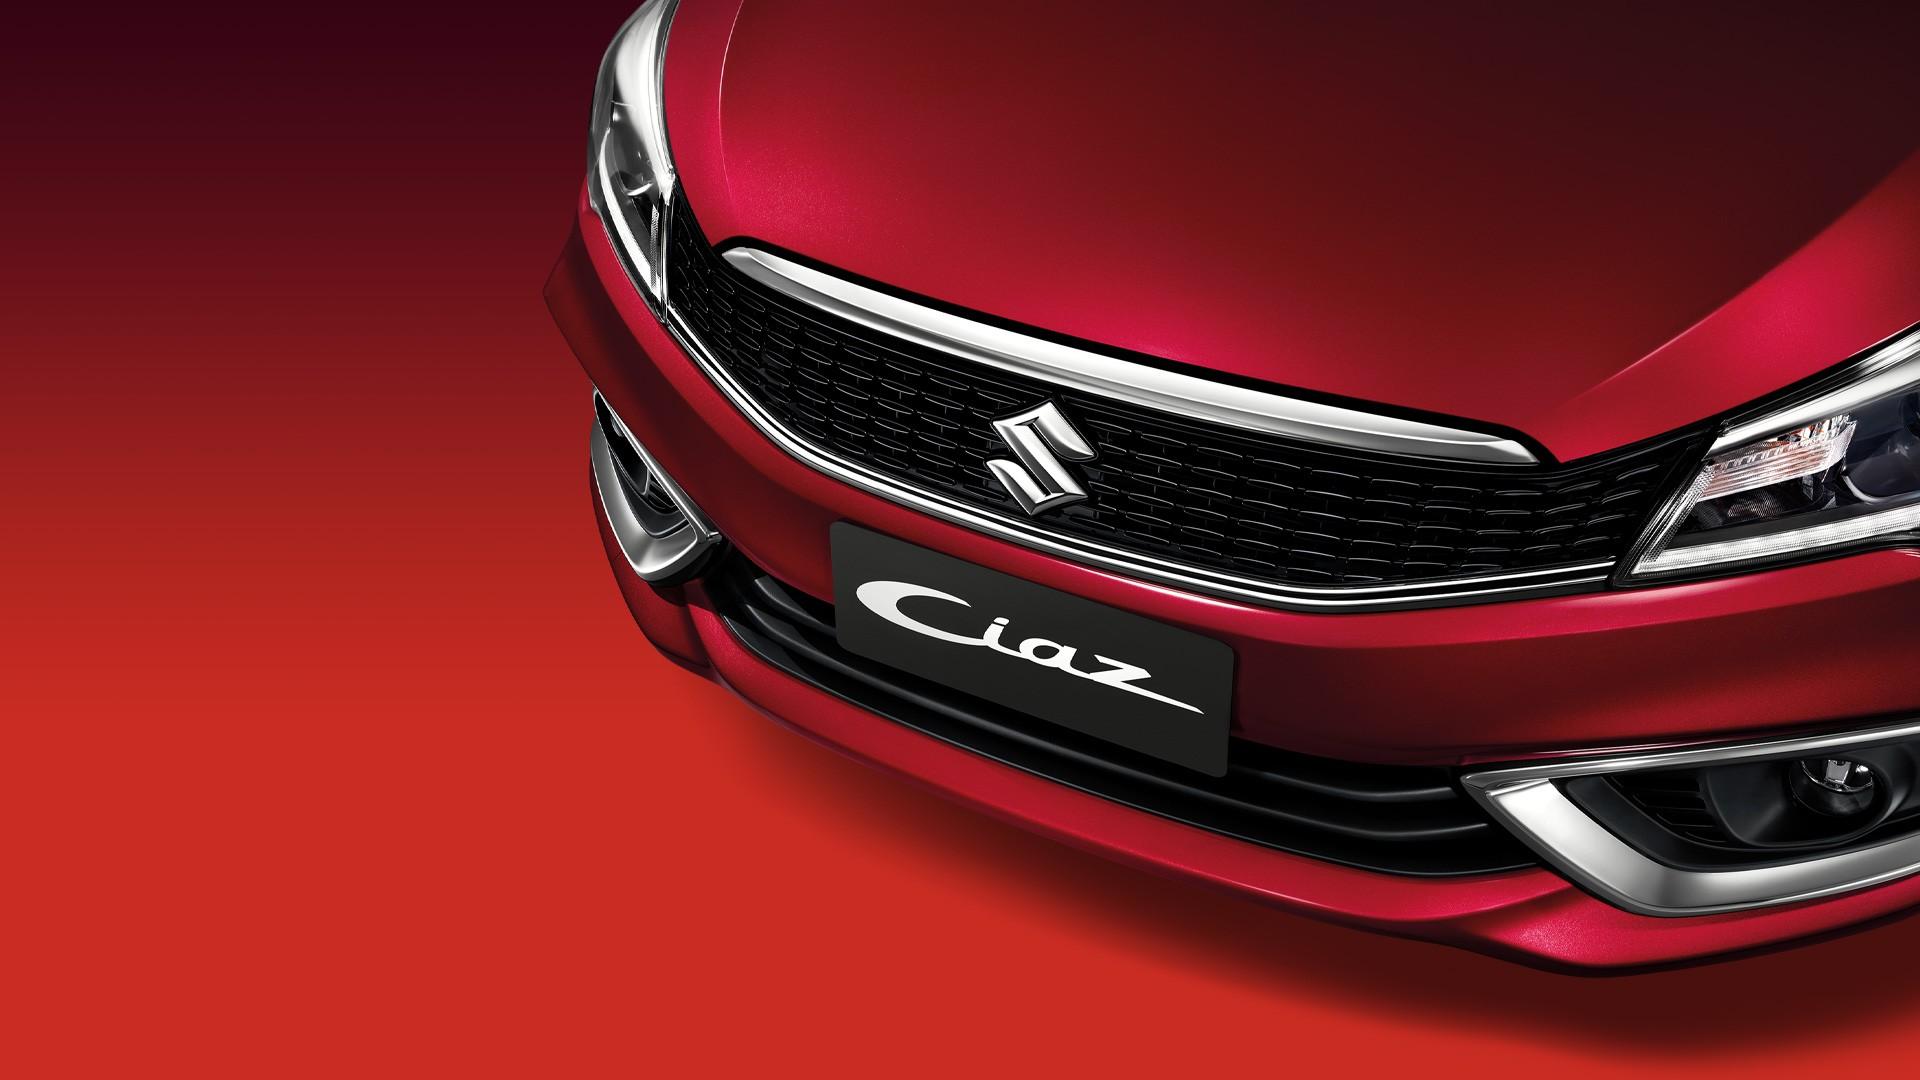 Suzuki Ciaz กระจังหน้าใหม่สไตล์สปอร์ตดุดัน